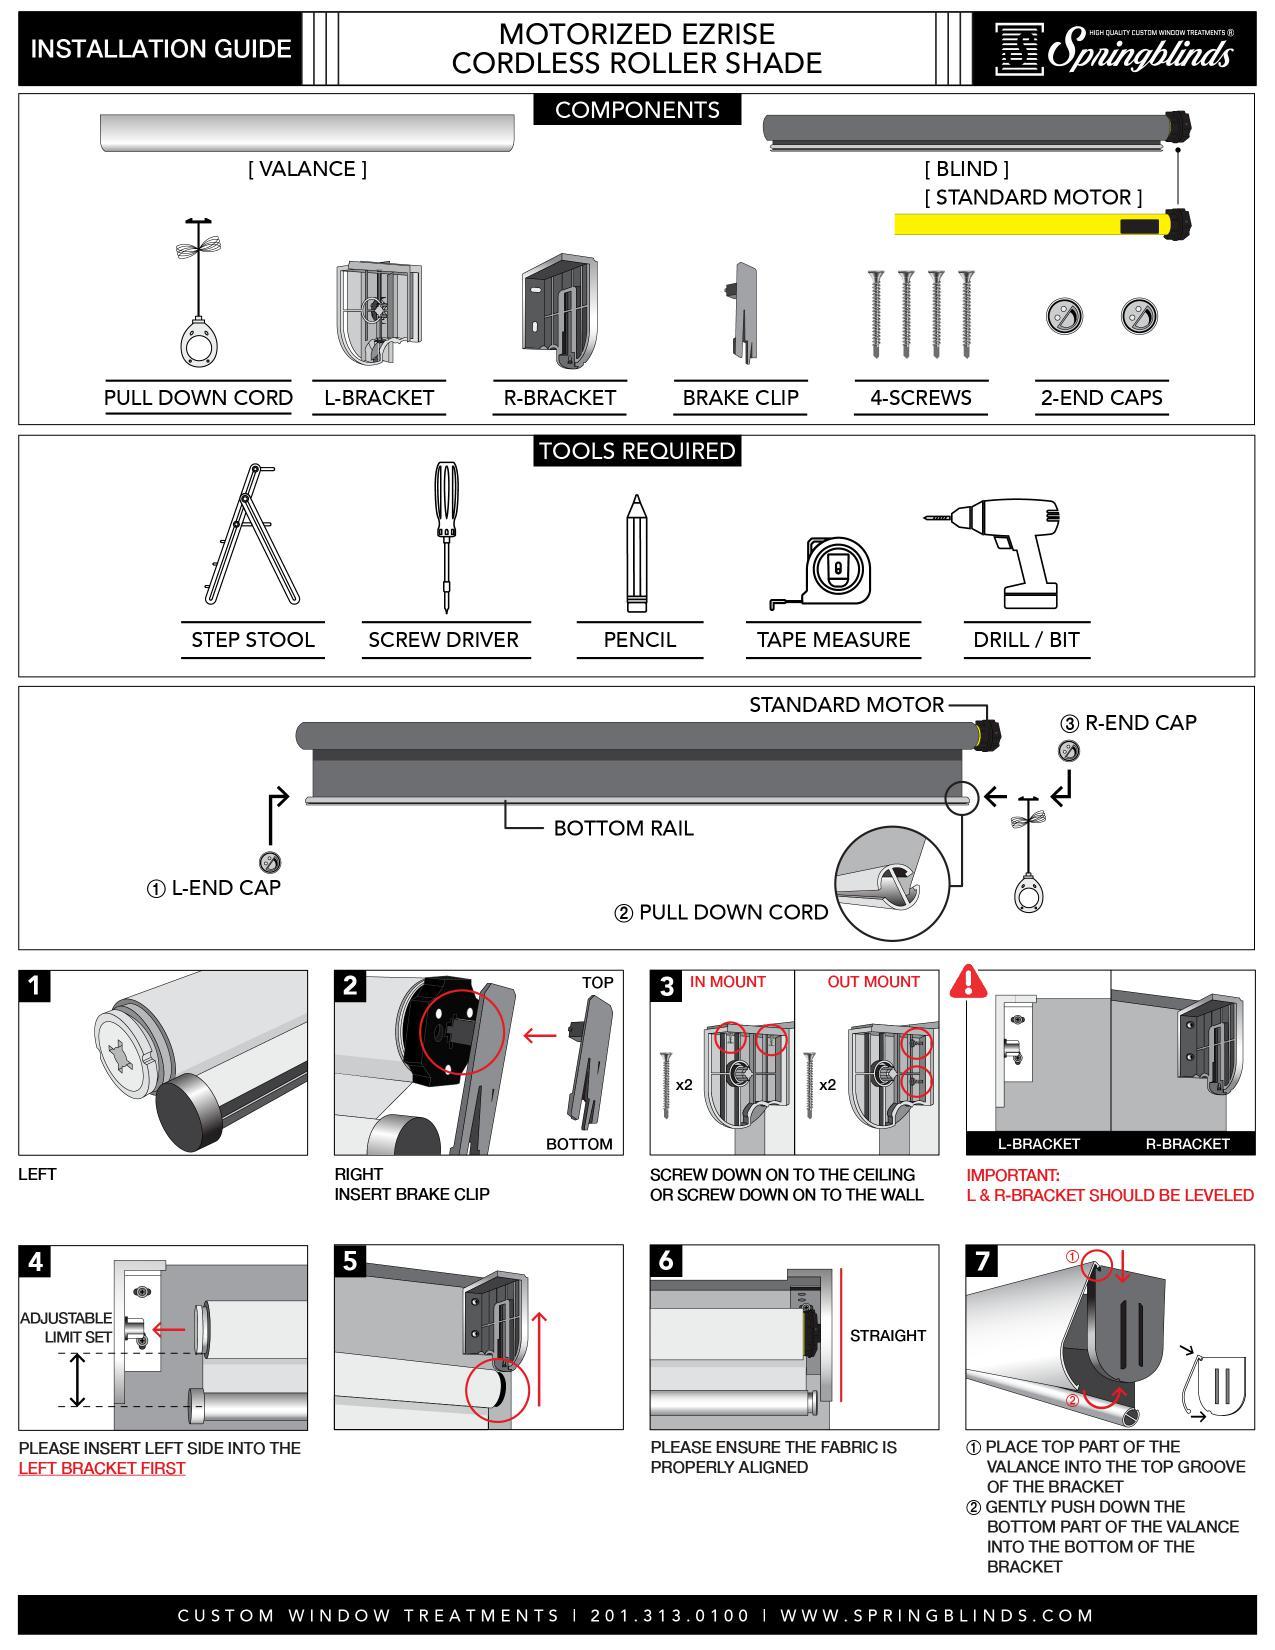 motorized-ezrise-cordless-roller-shade-installation-guide.jpg